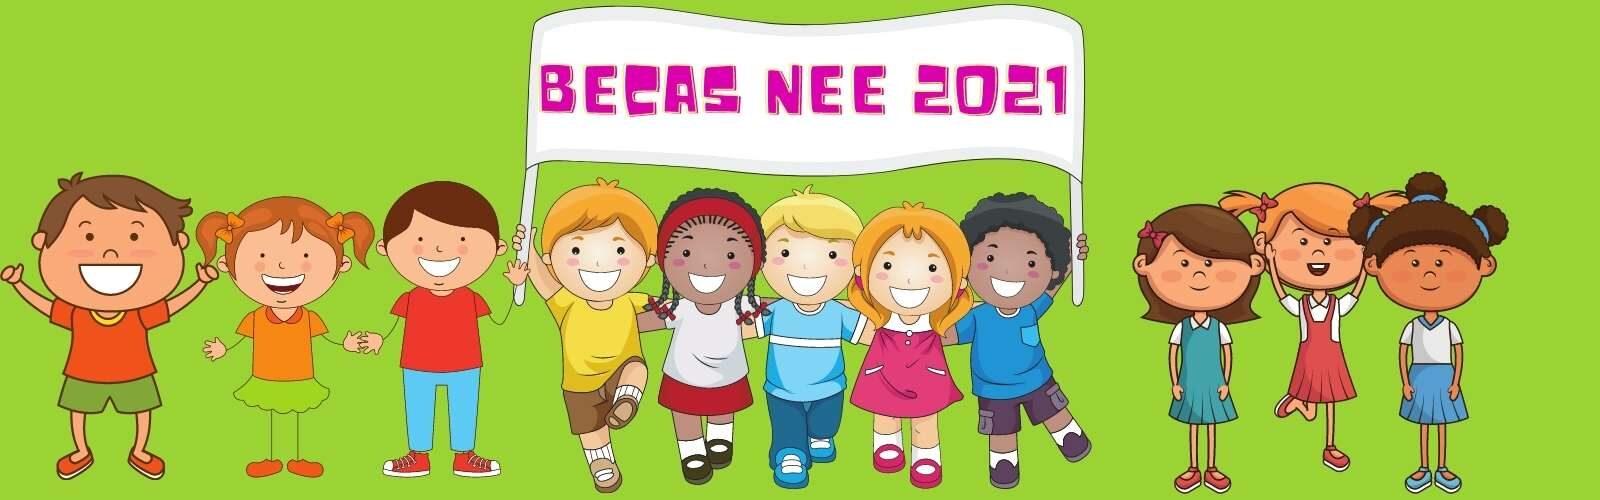 Becas NEE 2021